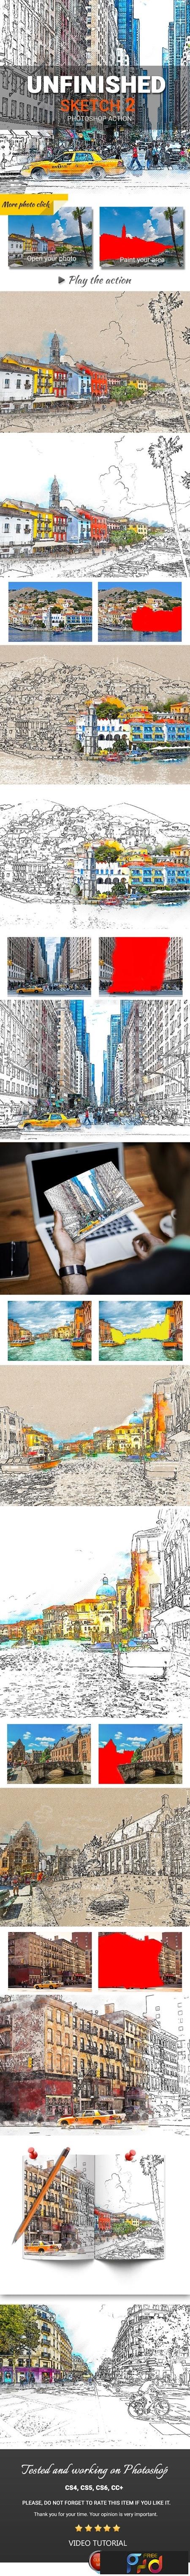 Urban Sketch2 Photoshop Action 23600694 1